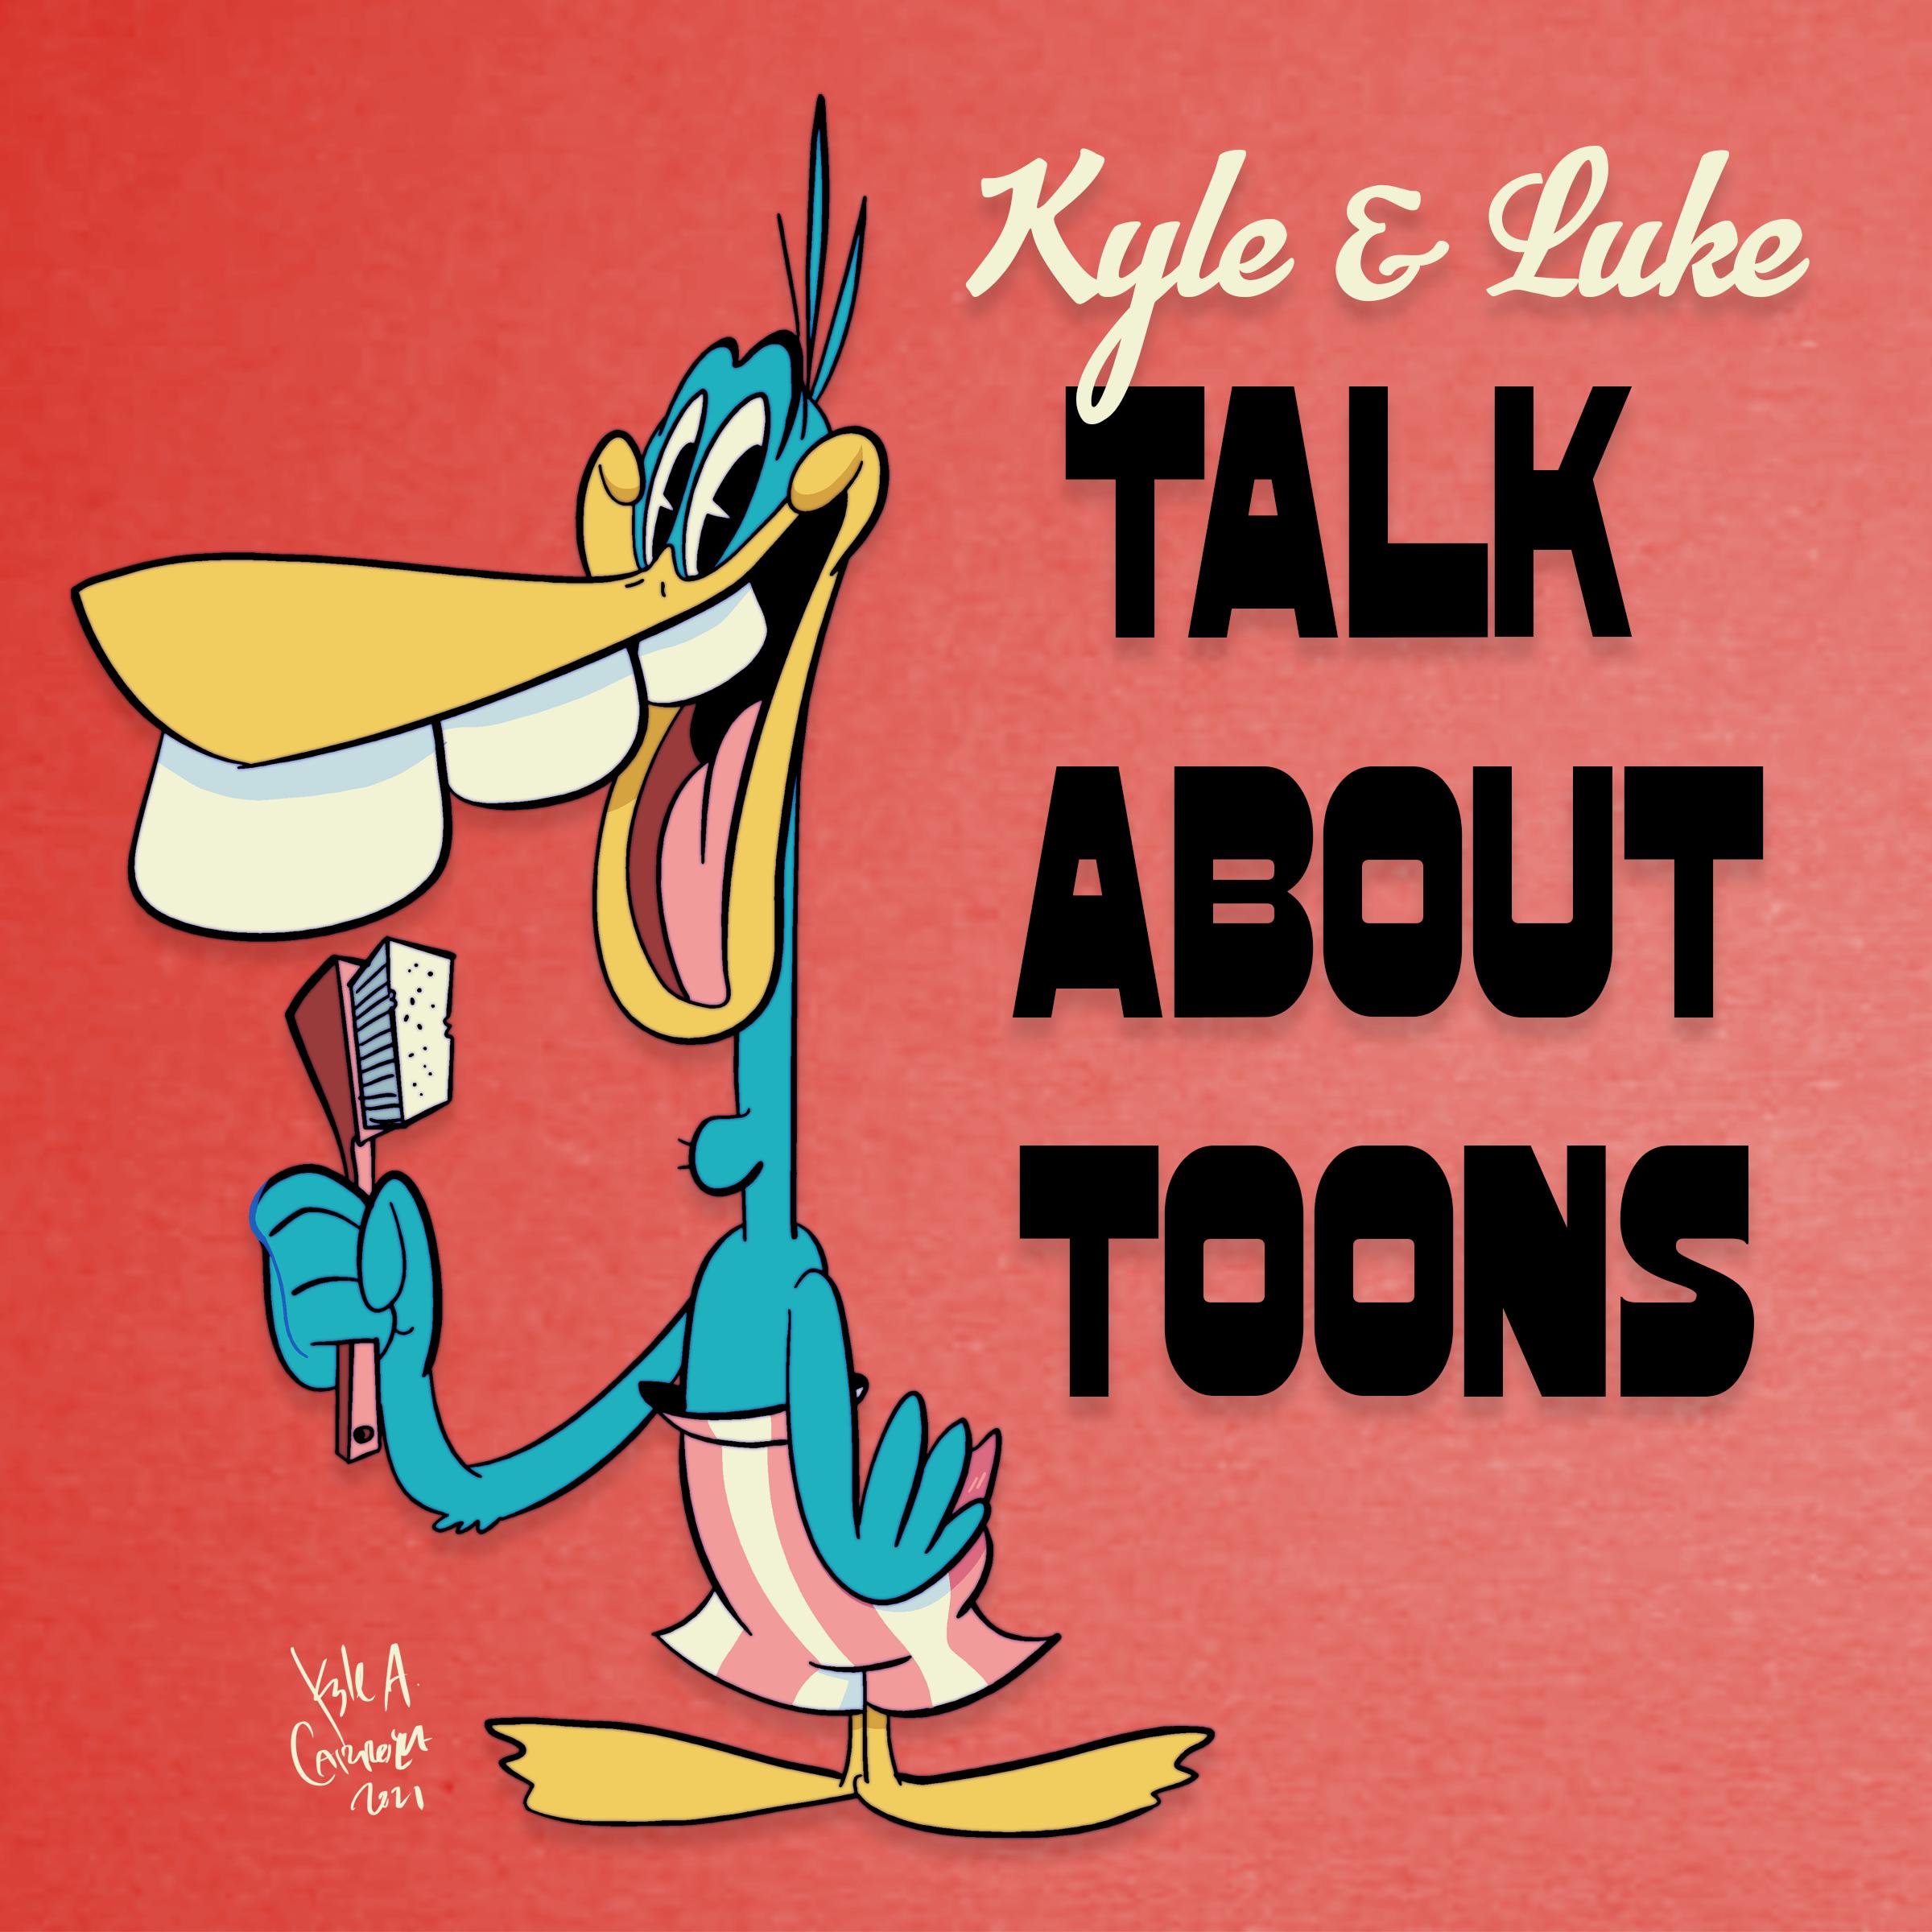 Kyle and Luke Talk About Toons #187: Creative Manic Burst of Stupid Energy